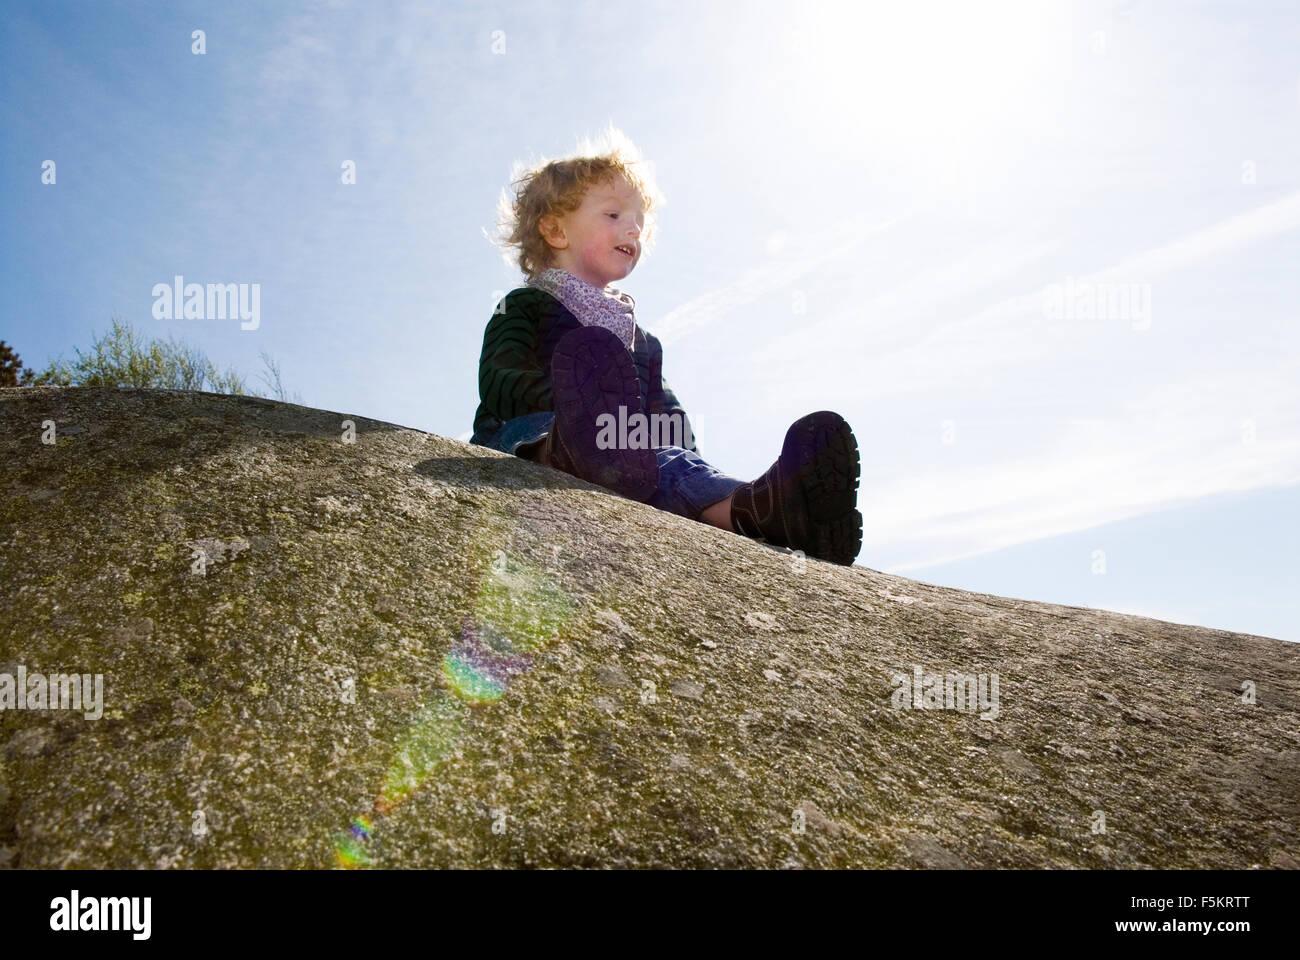 Sweden, Bohuslan, Boy (4-5) sitting on rock - Stock Image